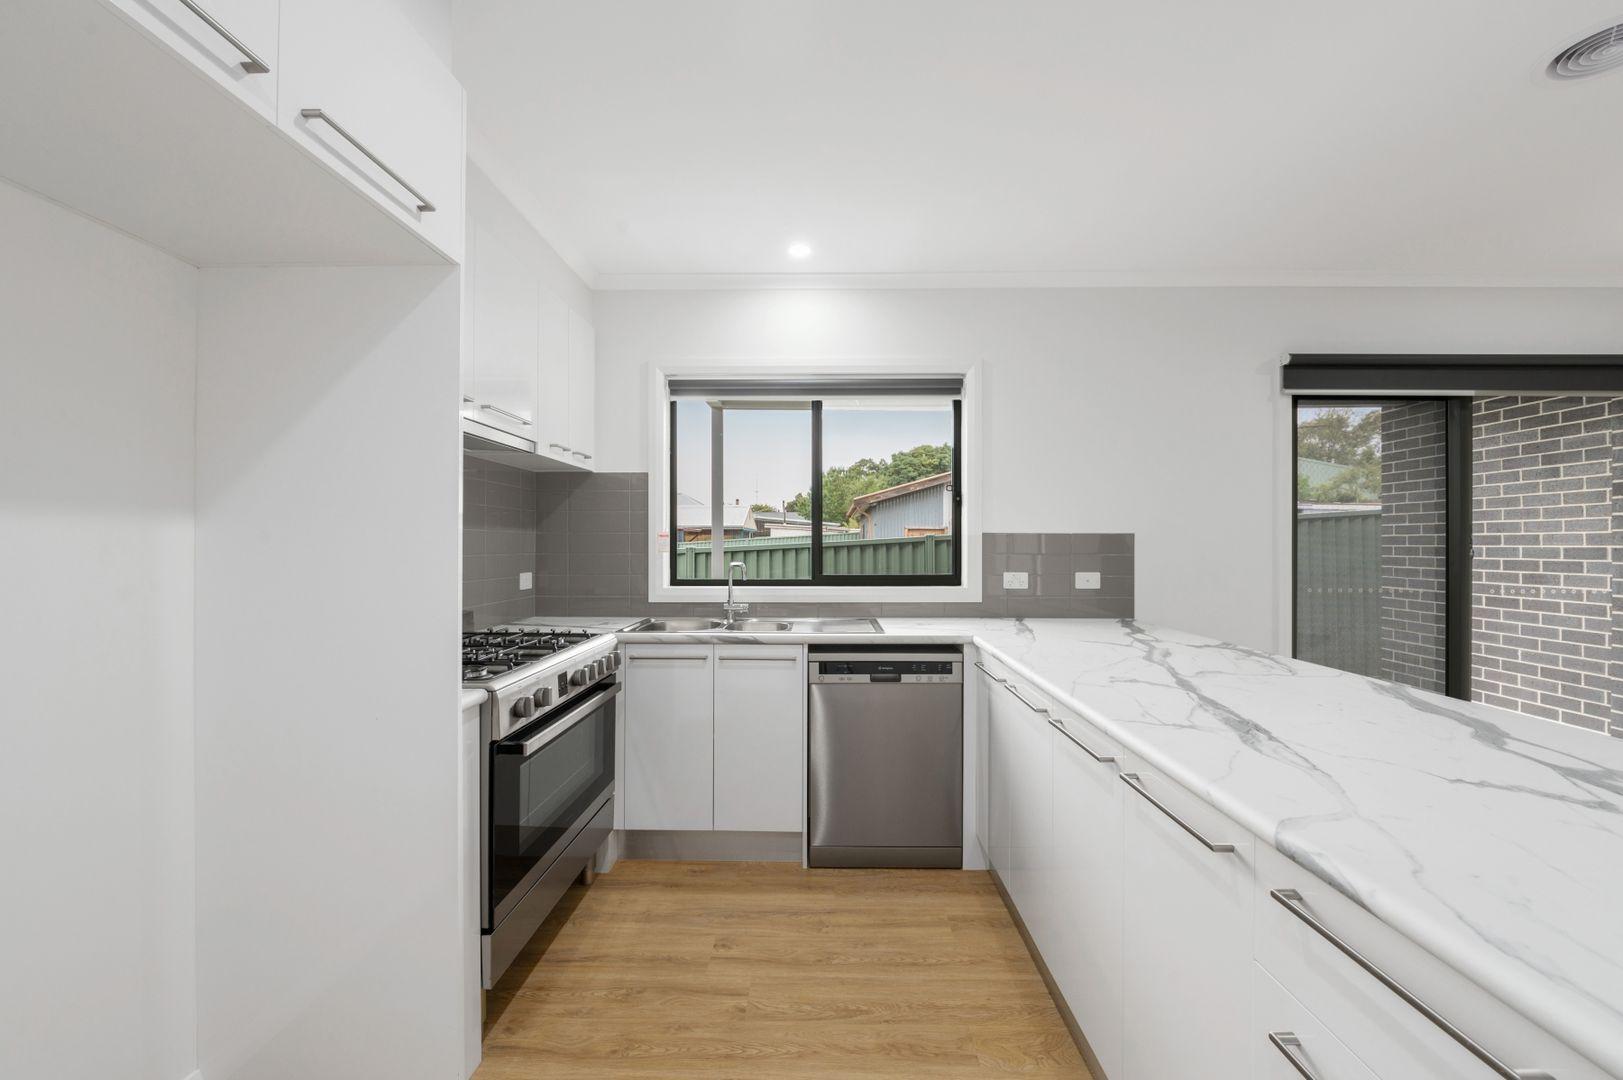 2/304 York Street, Ballarat East VIC 3350, Image 2